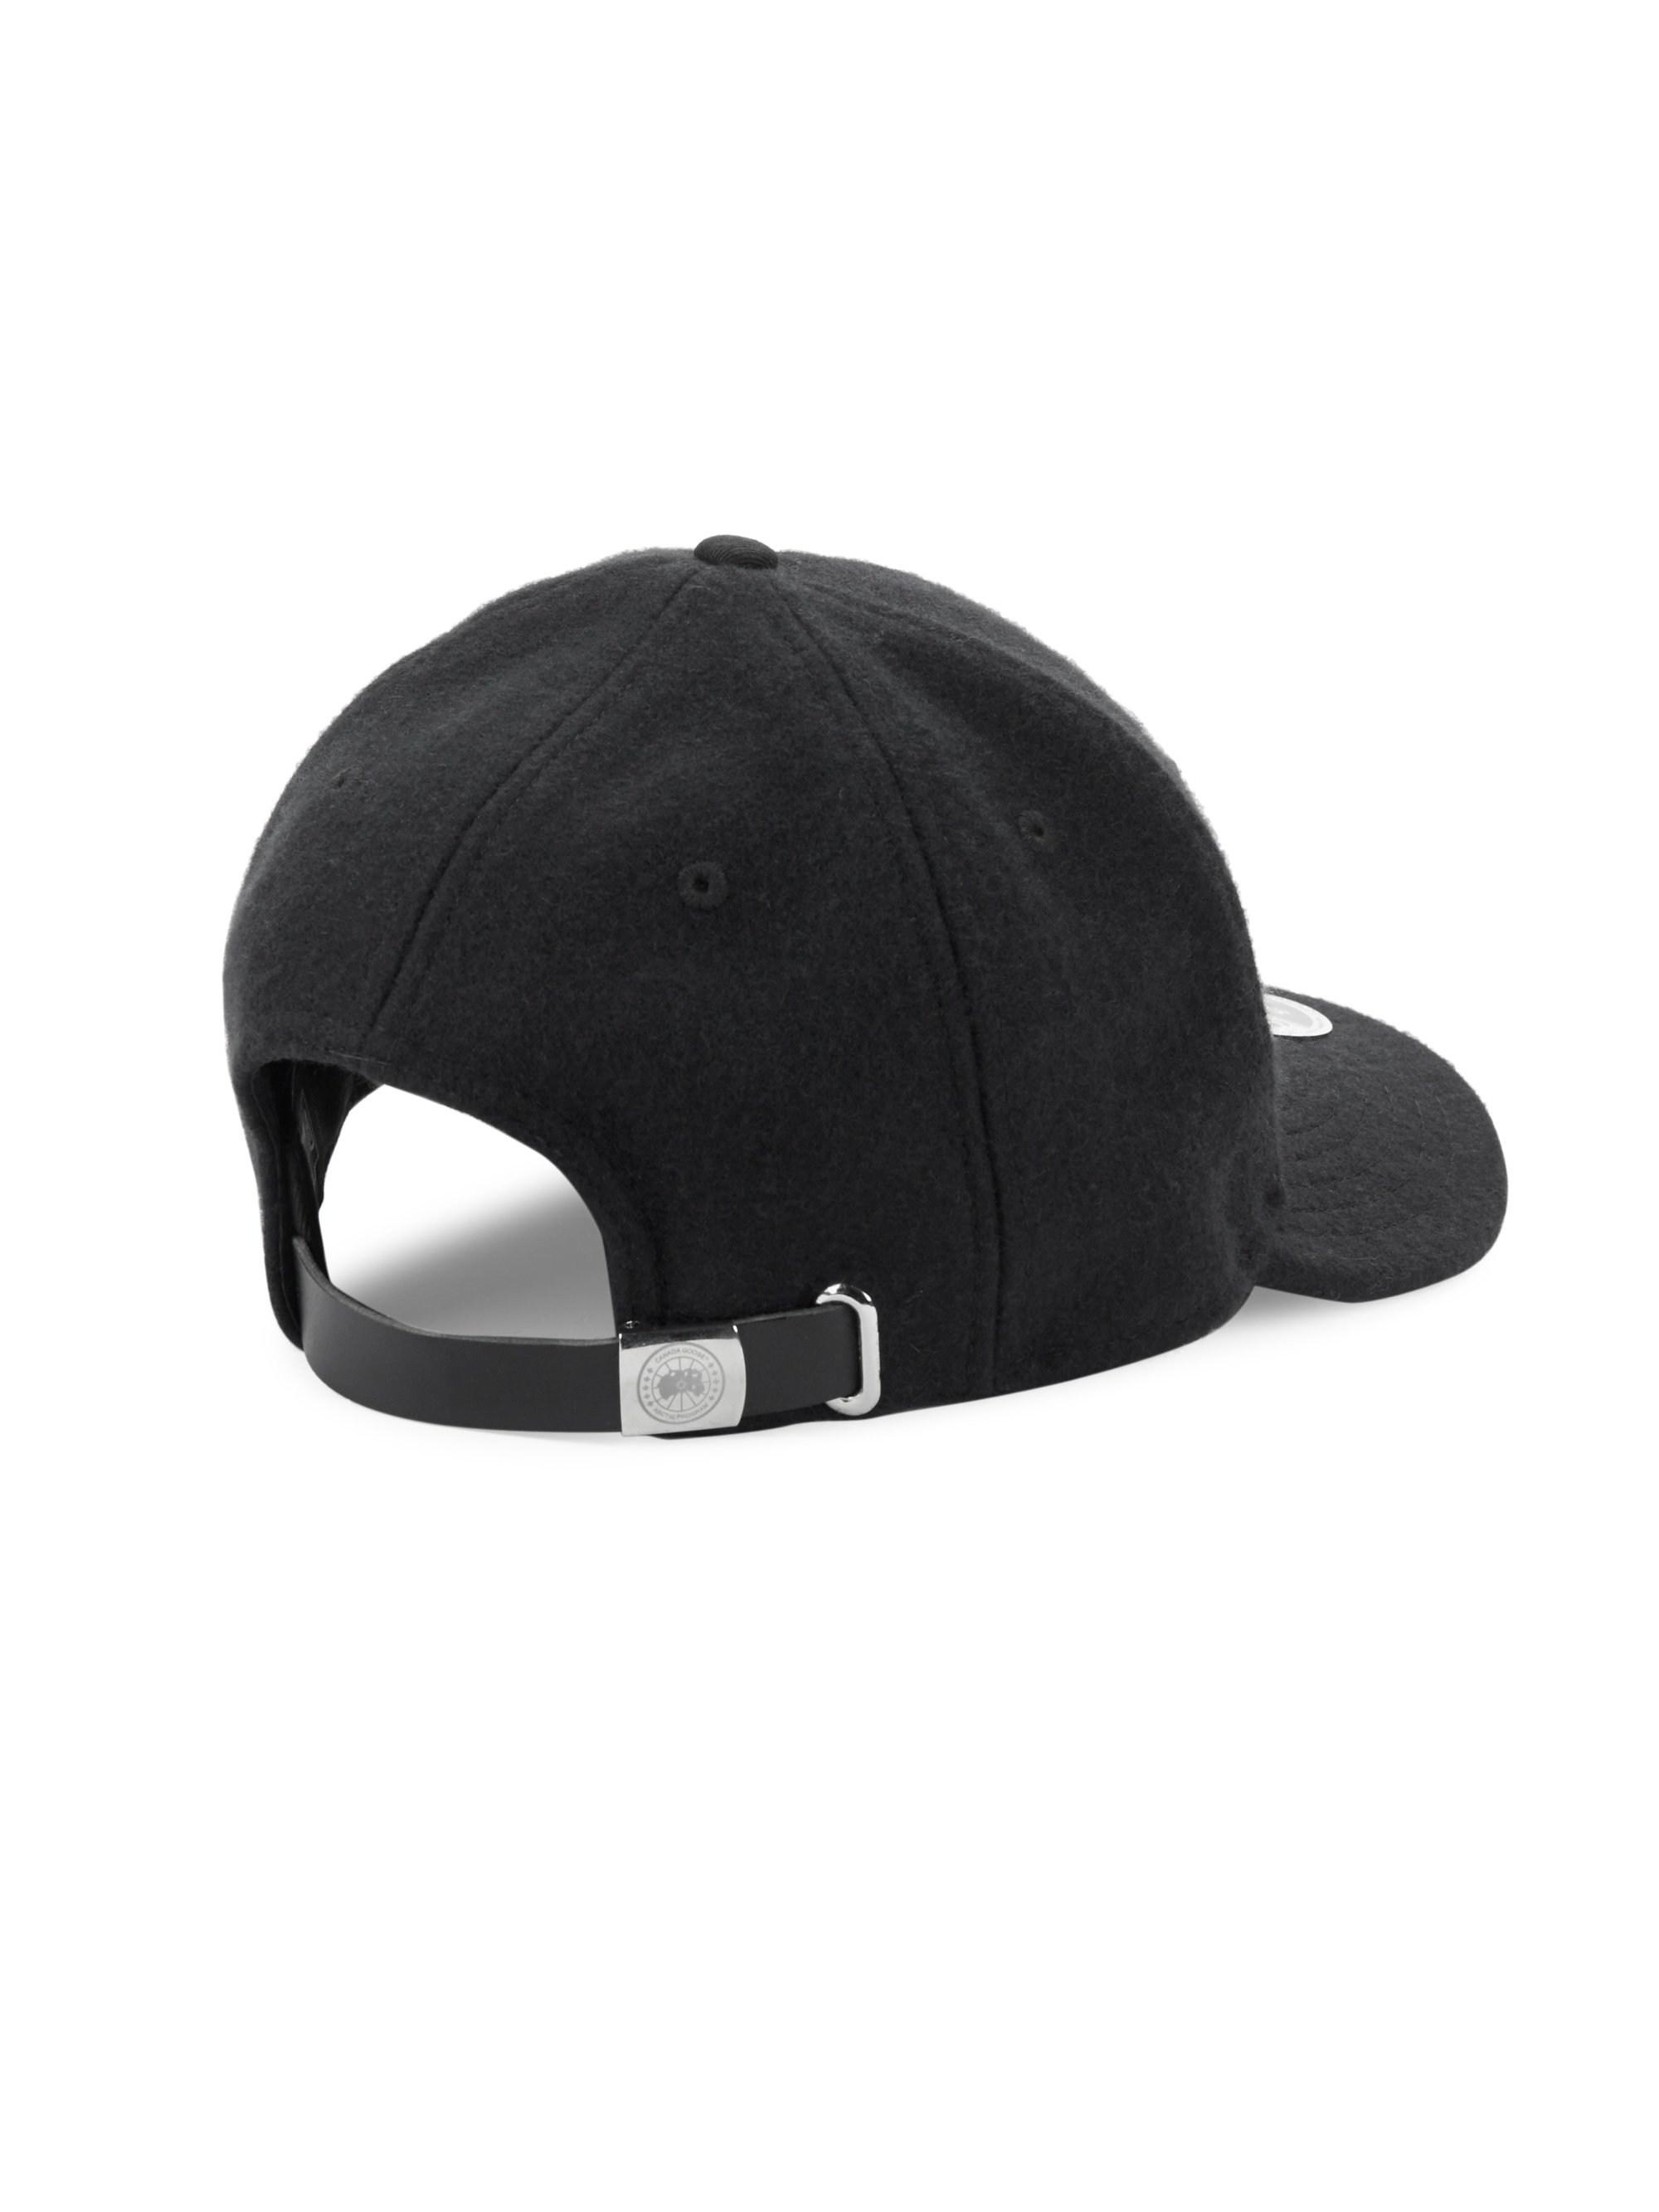 e400da9b8b1 Canada Goose - Black Melton Wool Baseball Hat for Men - Lyst. View  fullscreen